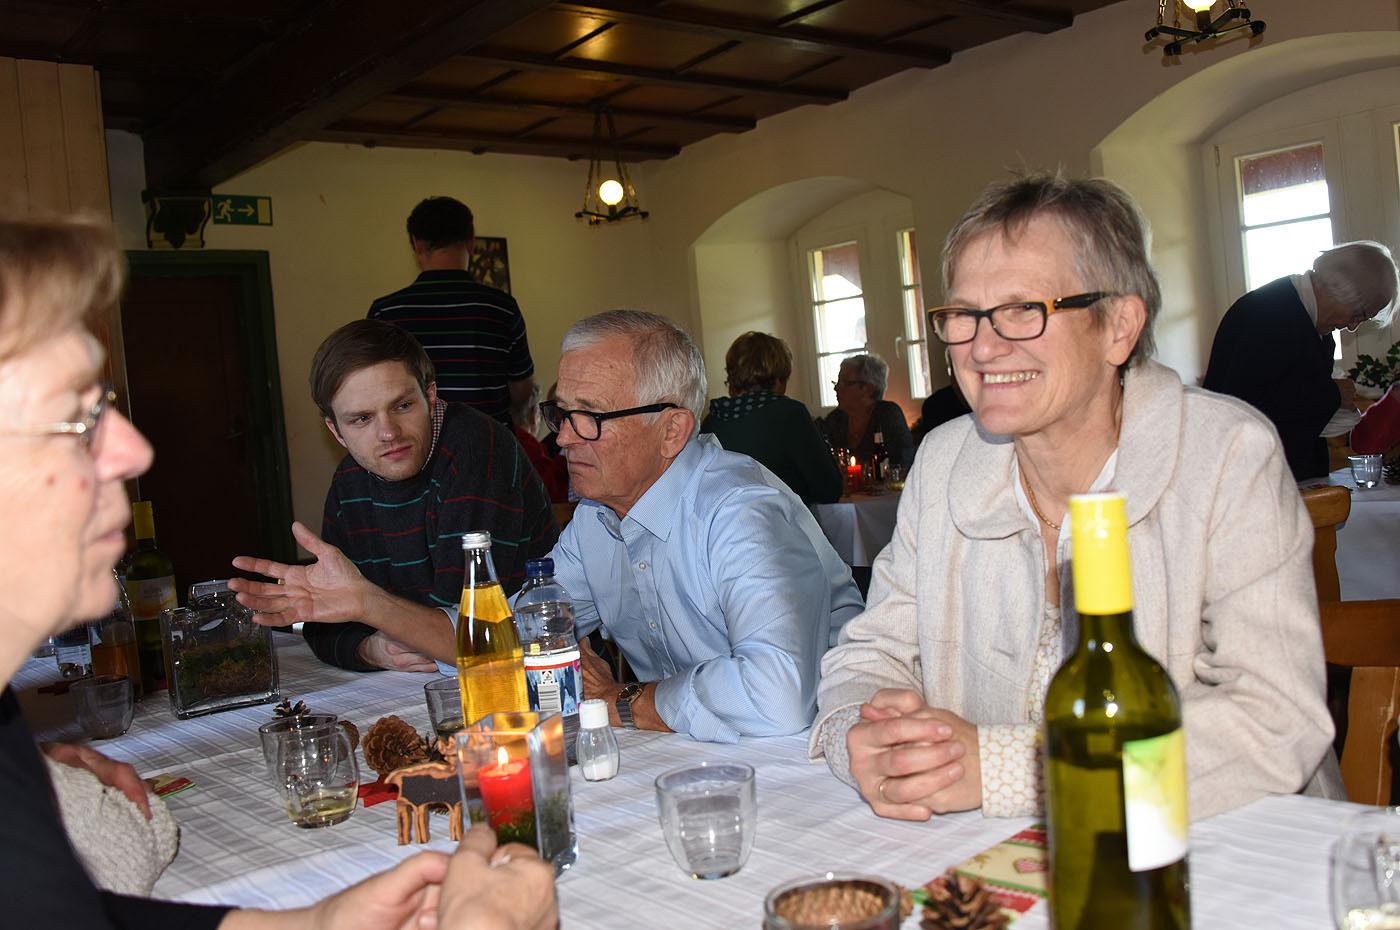 Familientag_23.11.14-Einsiedel_Foto Bückle_007